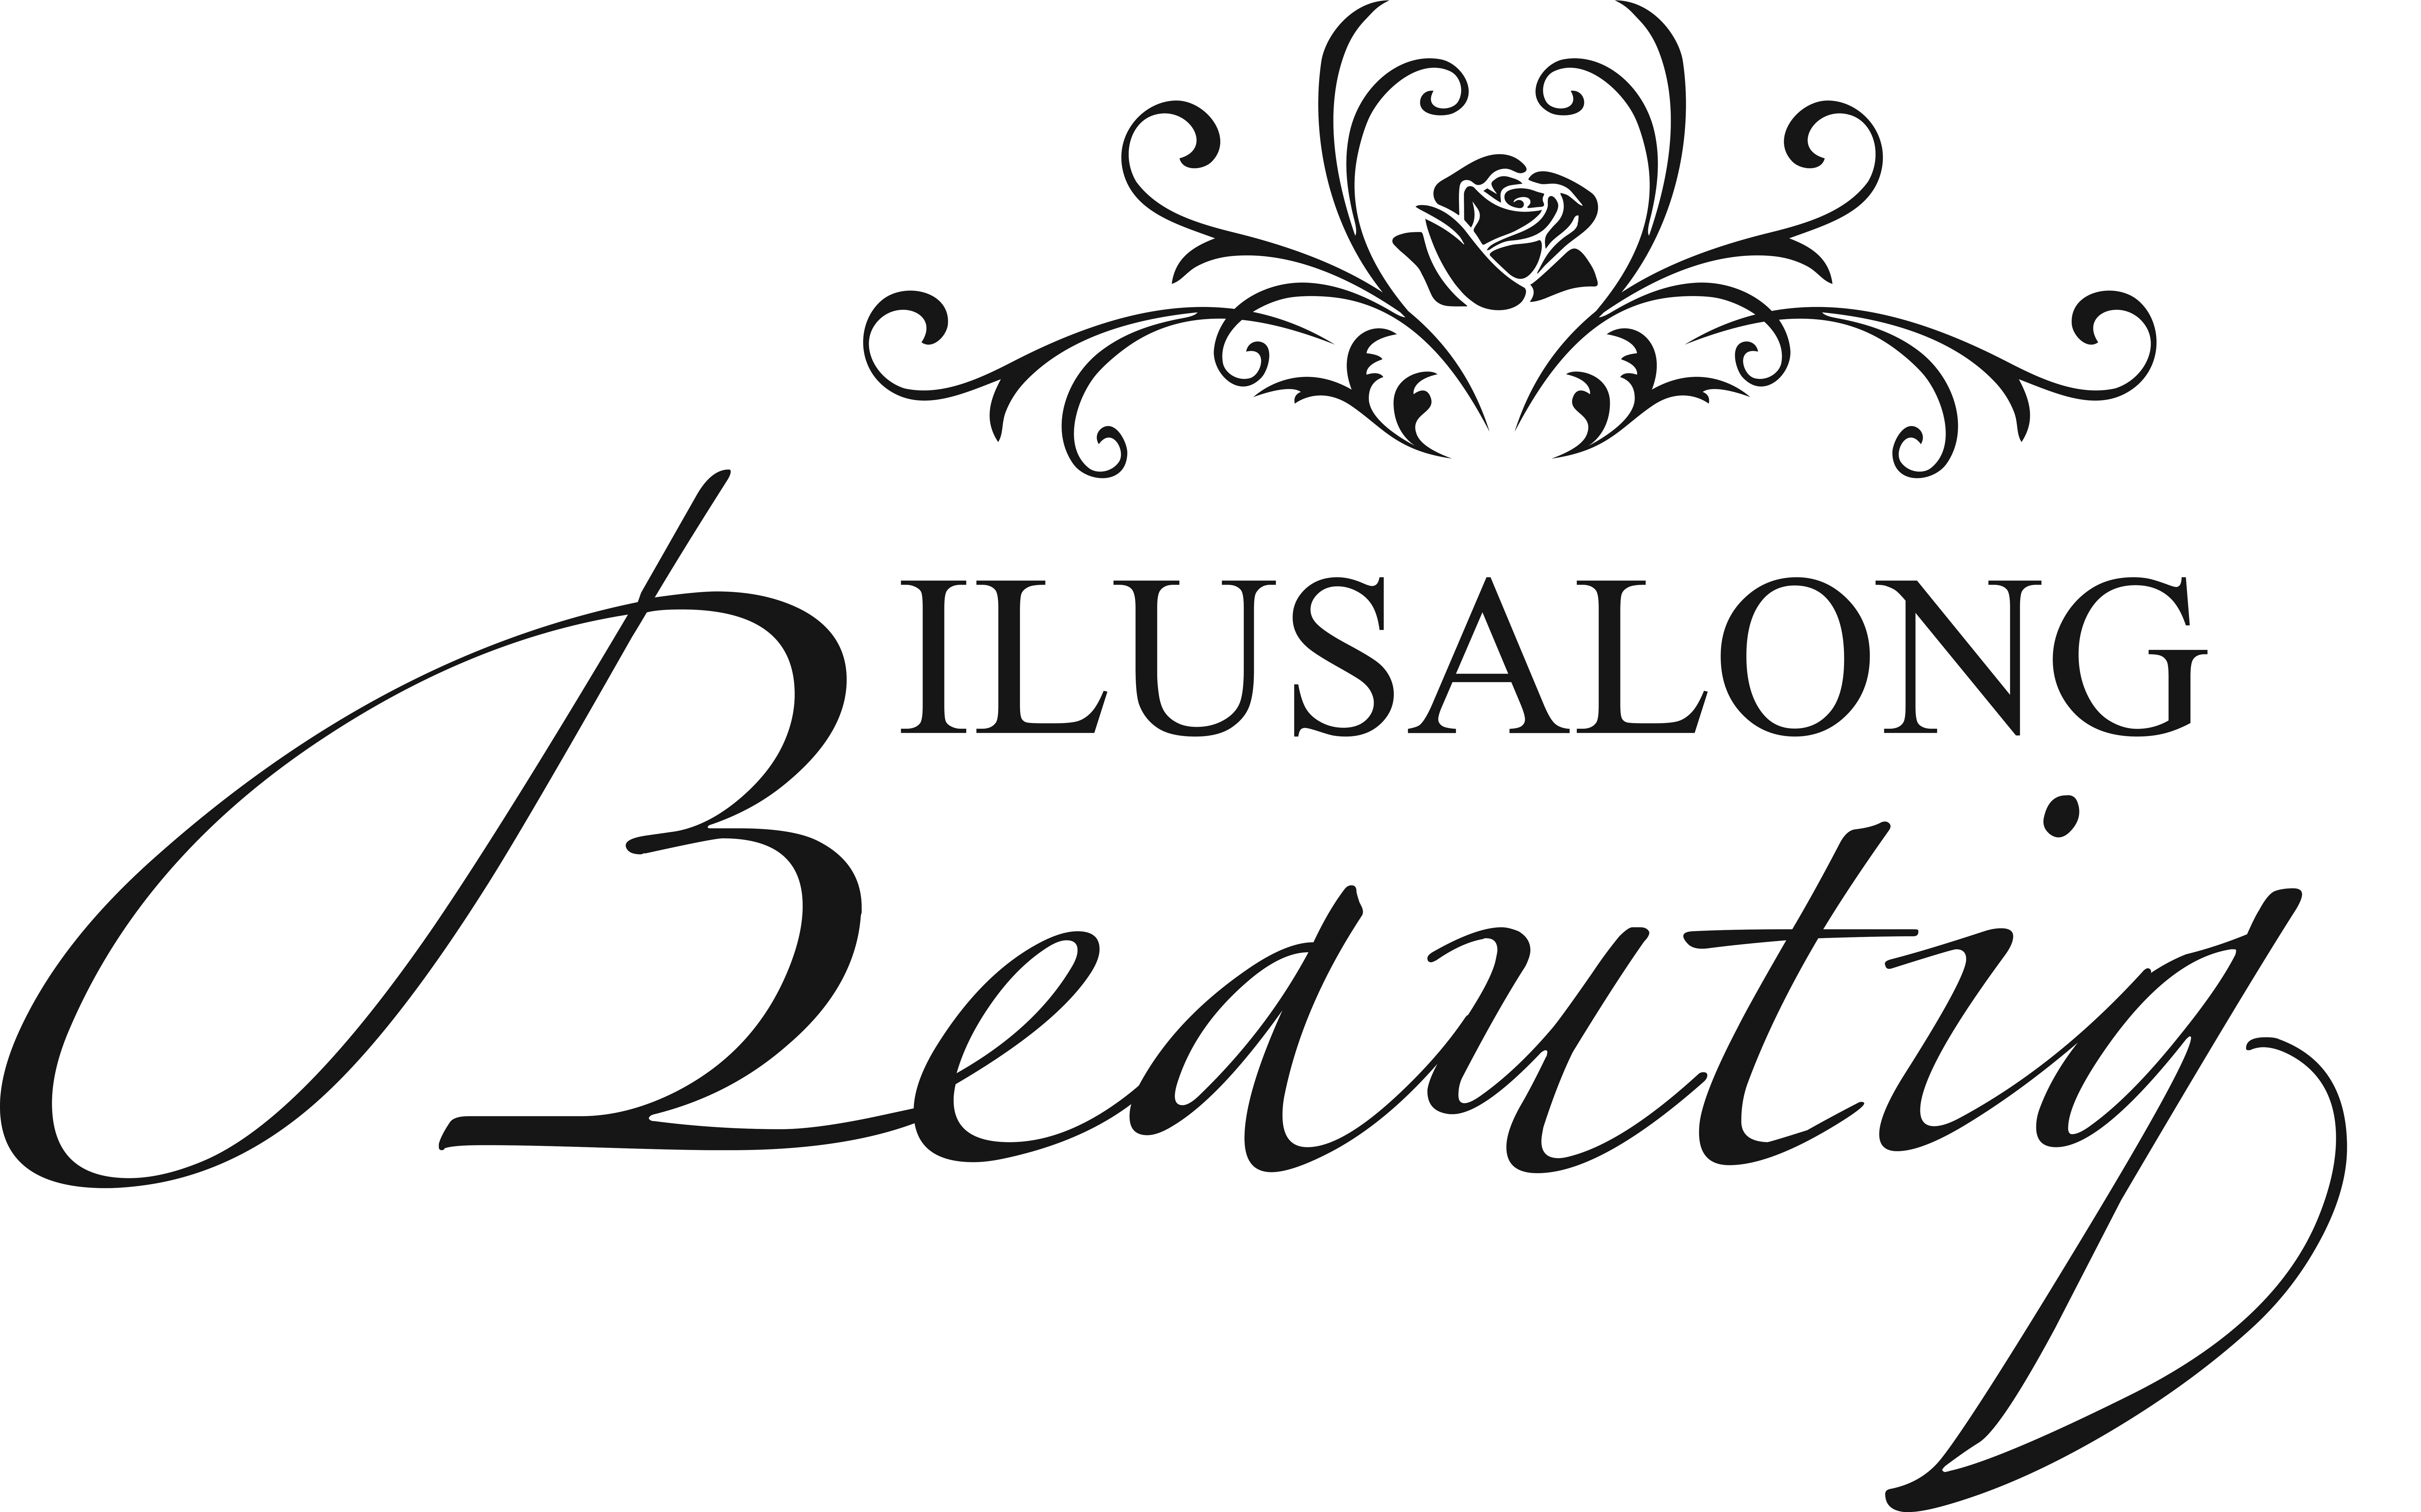 Ilusalong Beautiq